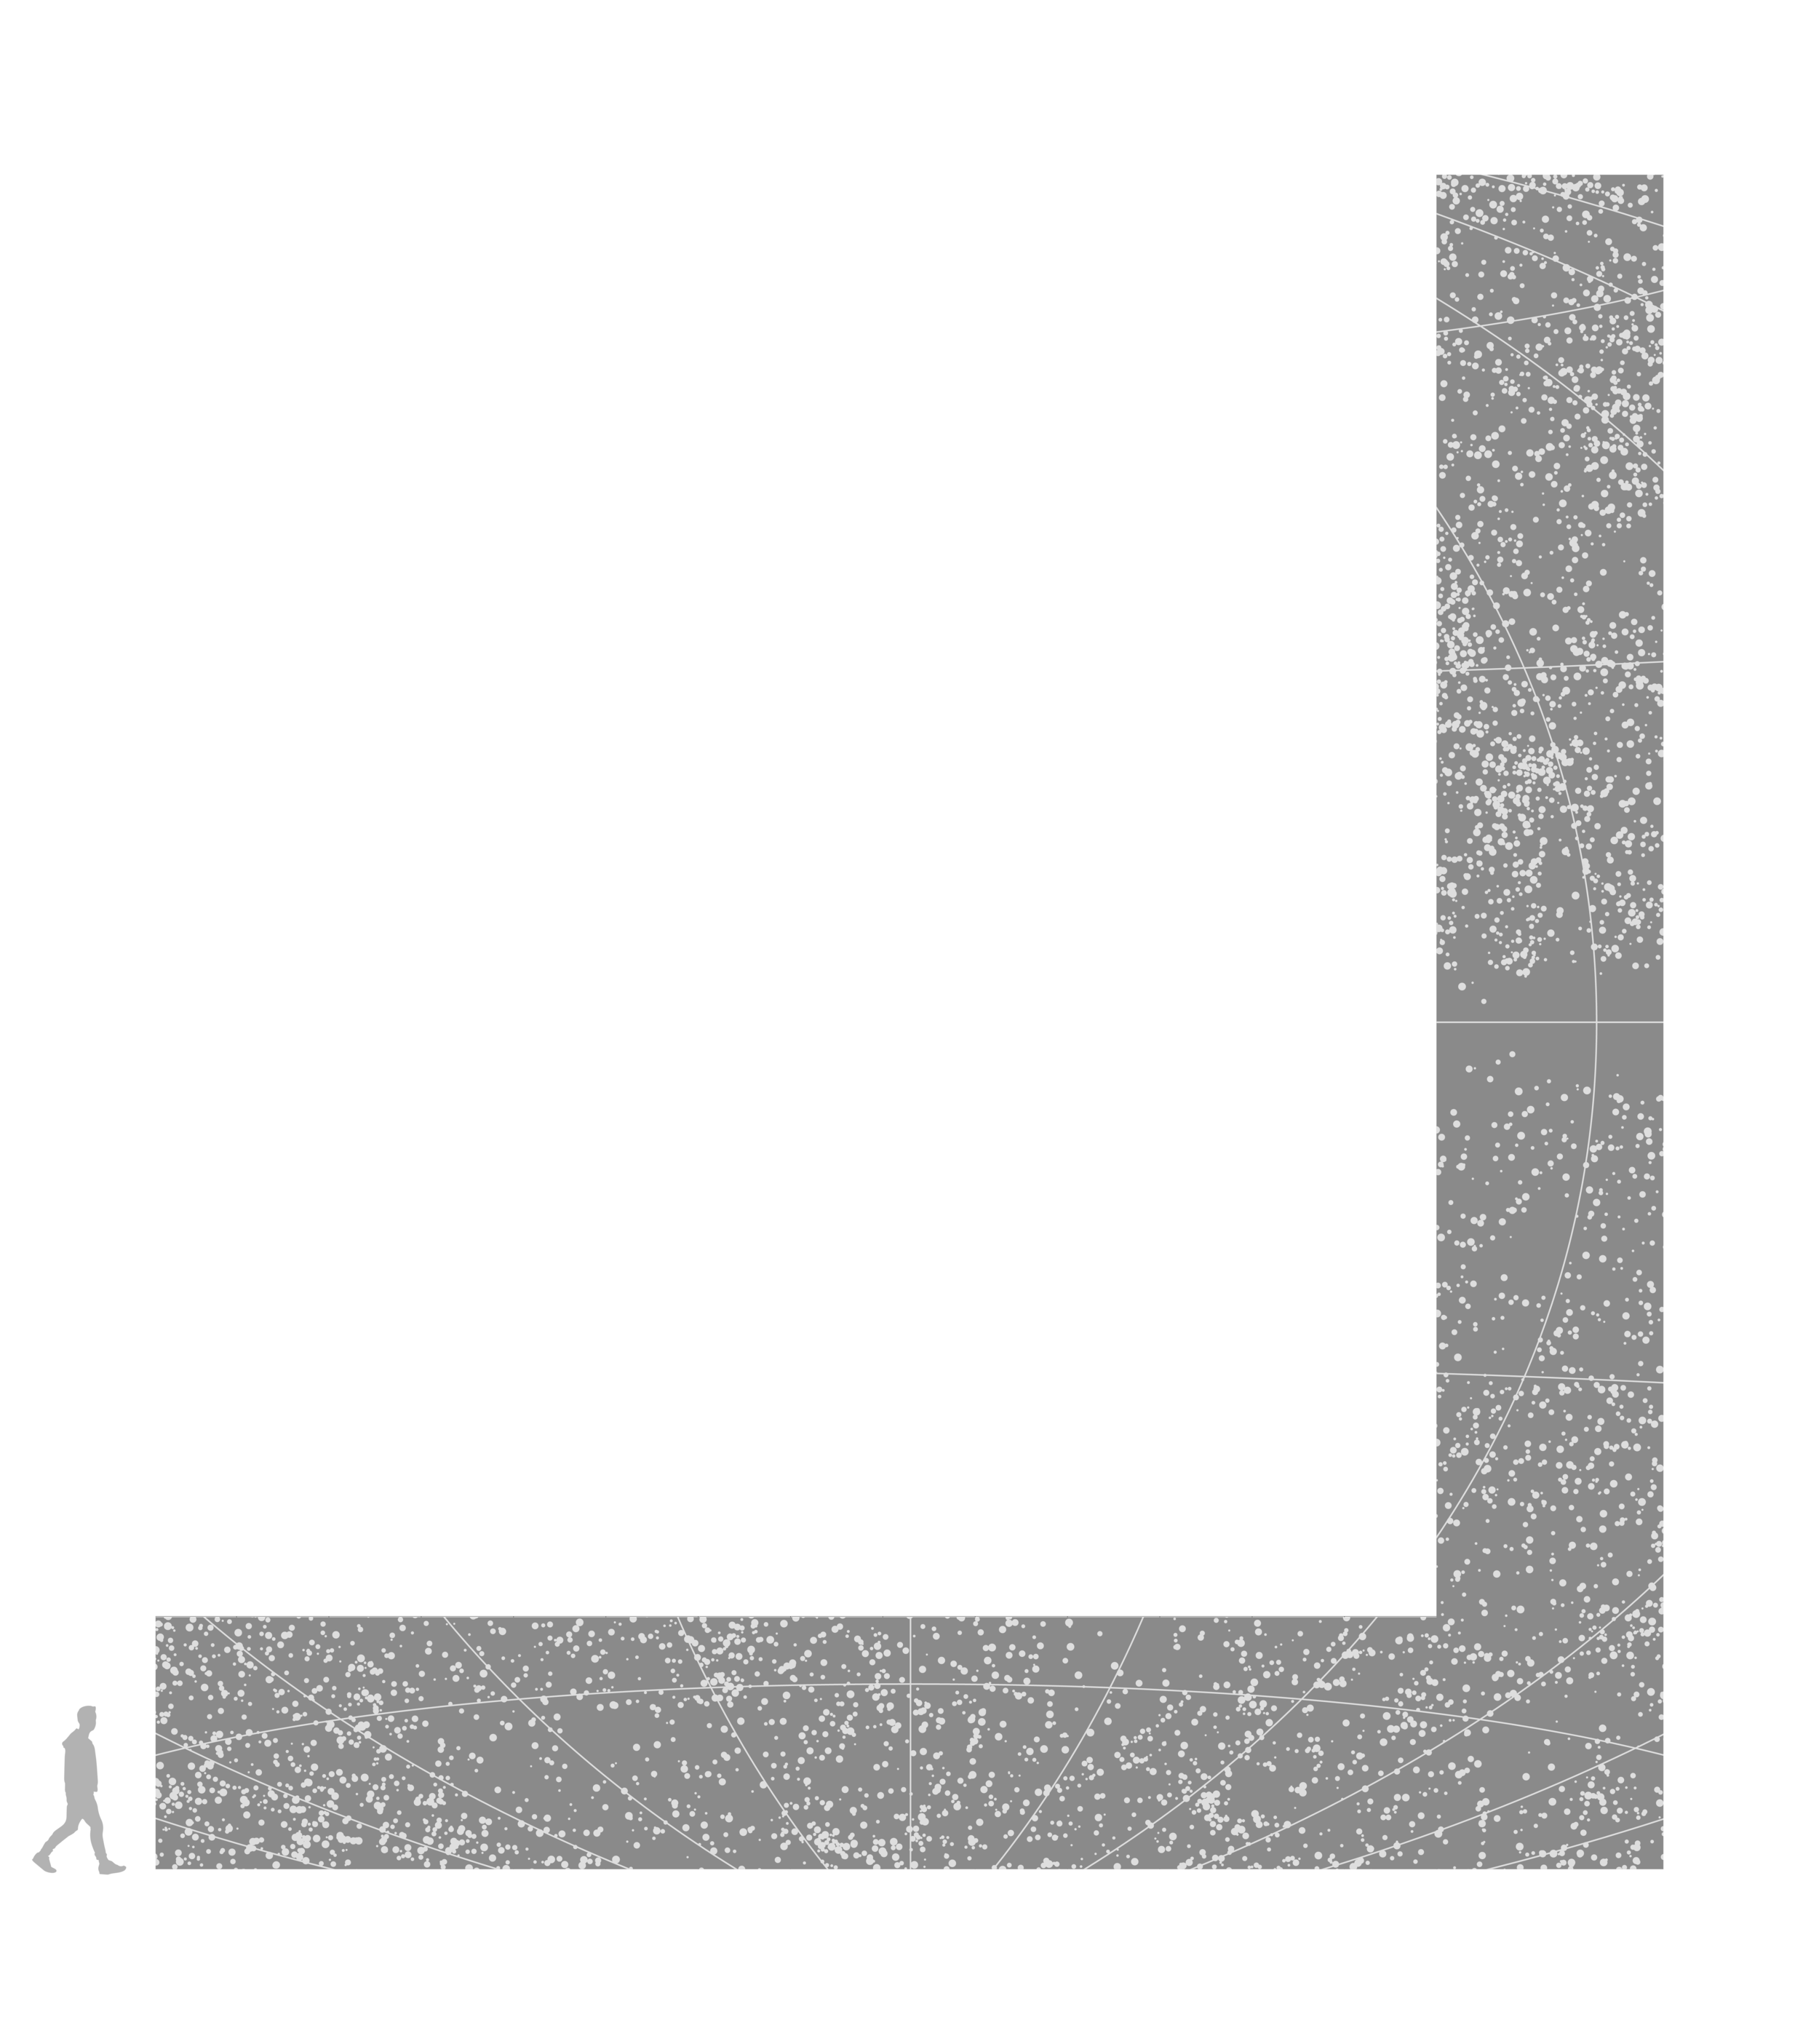 Walls_TypeHeight_All Walls-08_vector.png